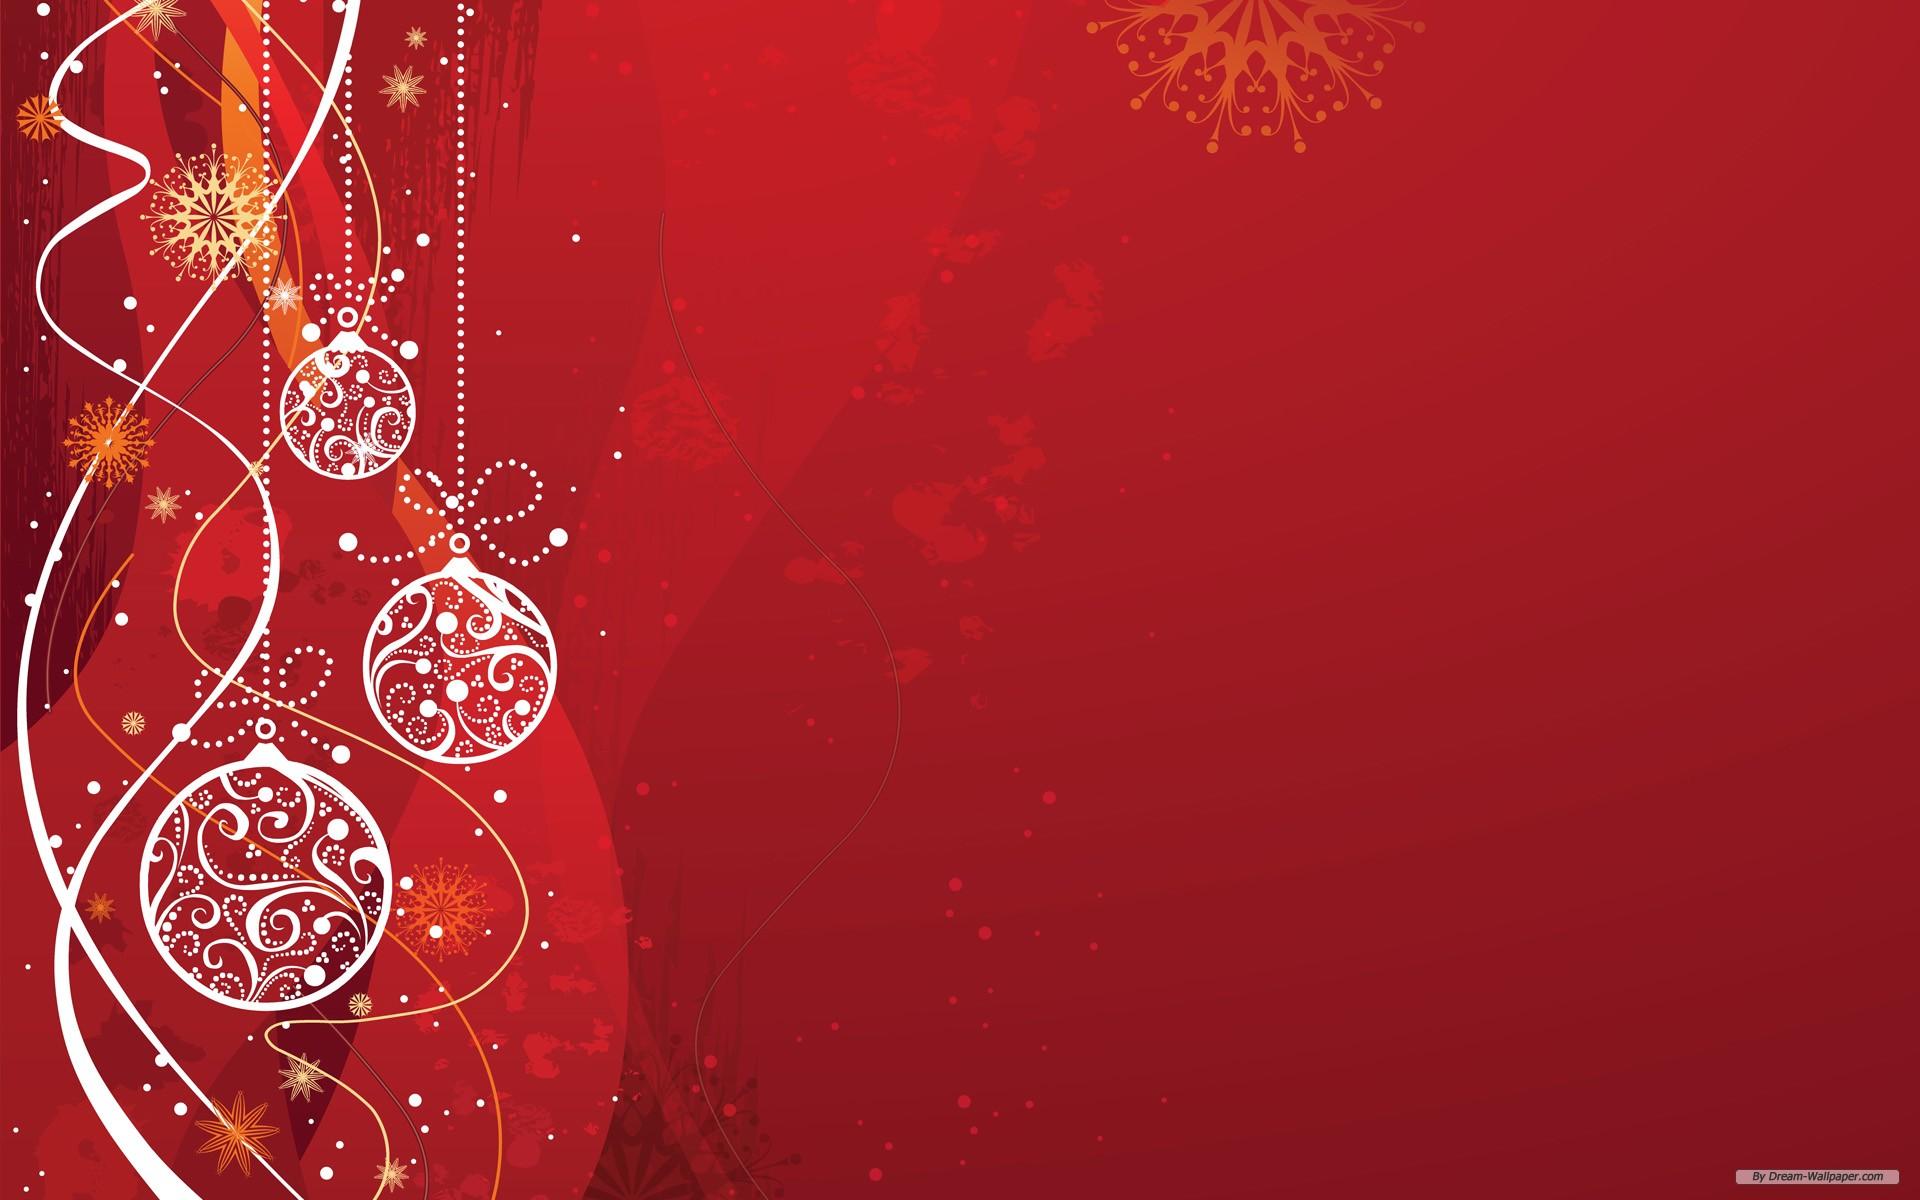 Holiday wallpaper Christmas theme 8 wallpaper 19201200 wallpaper 1920x1200